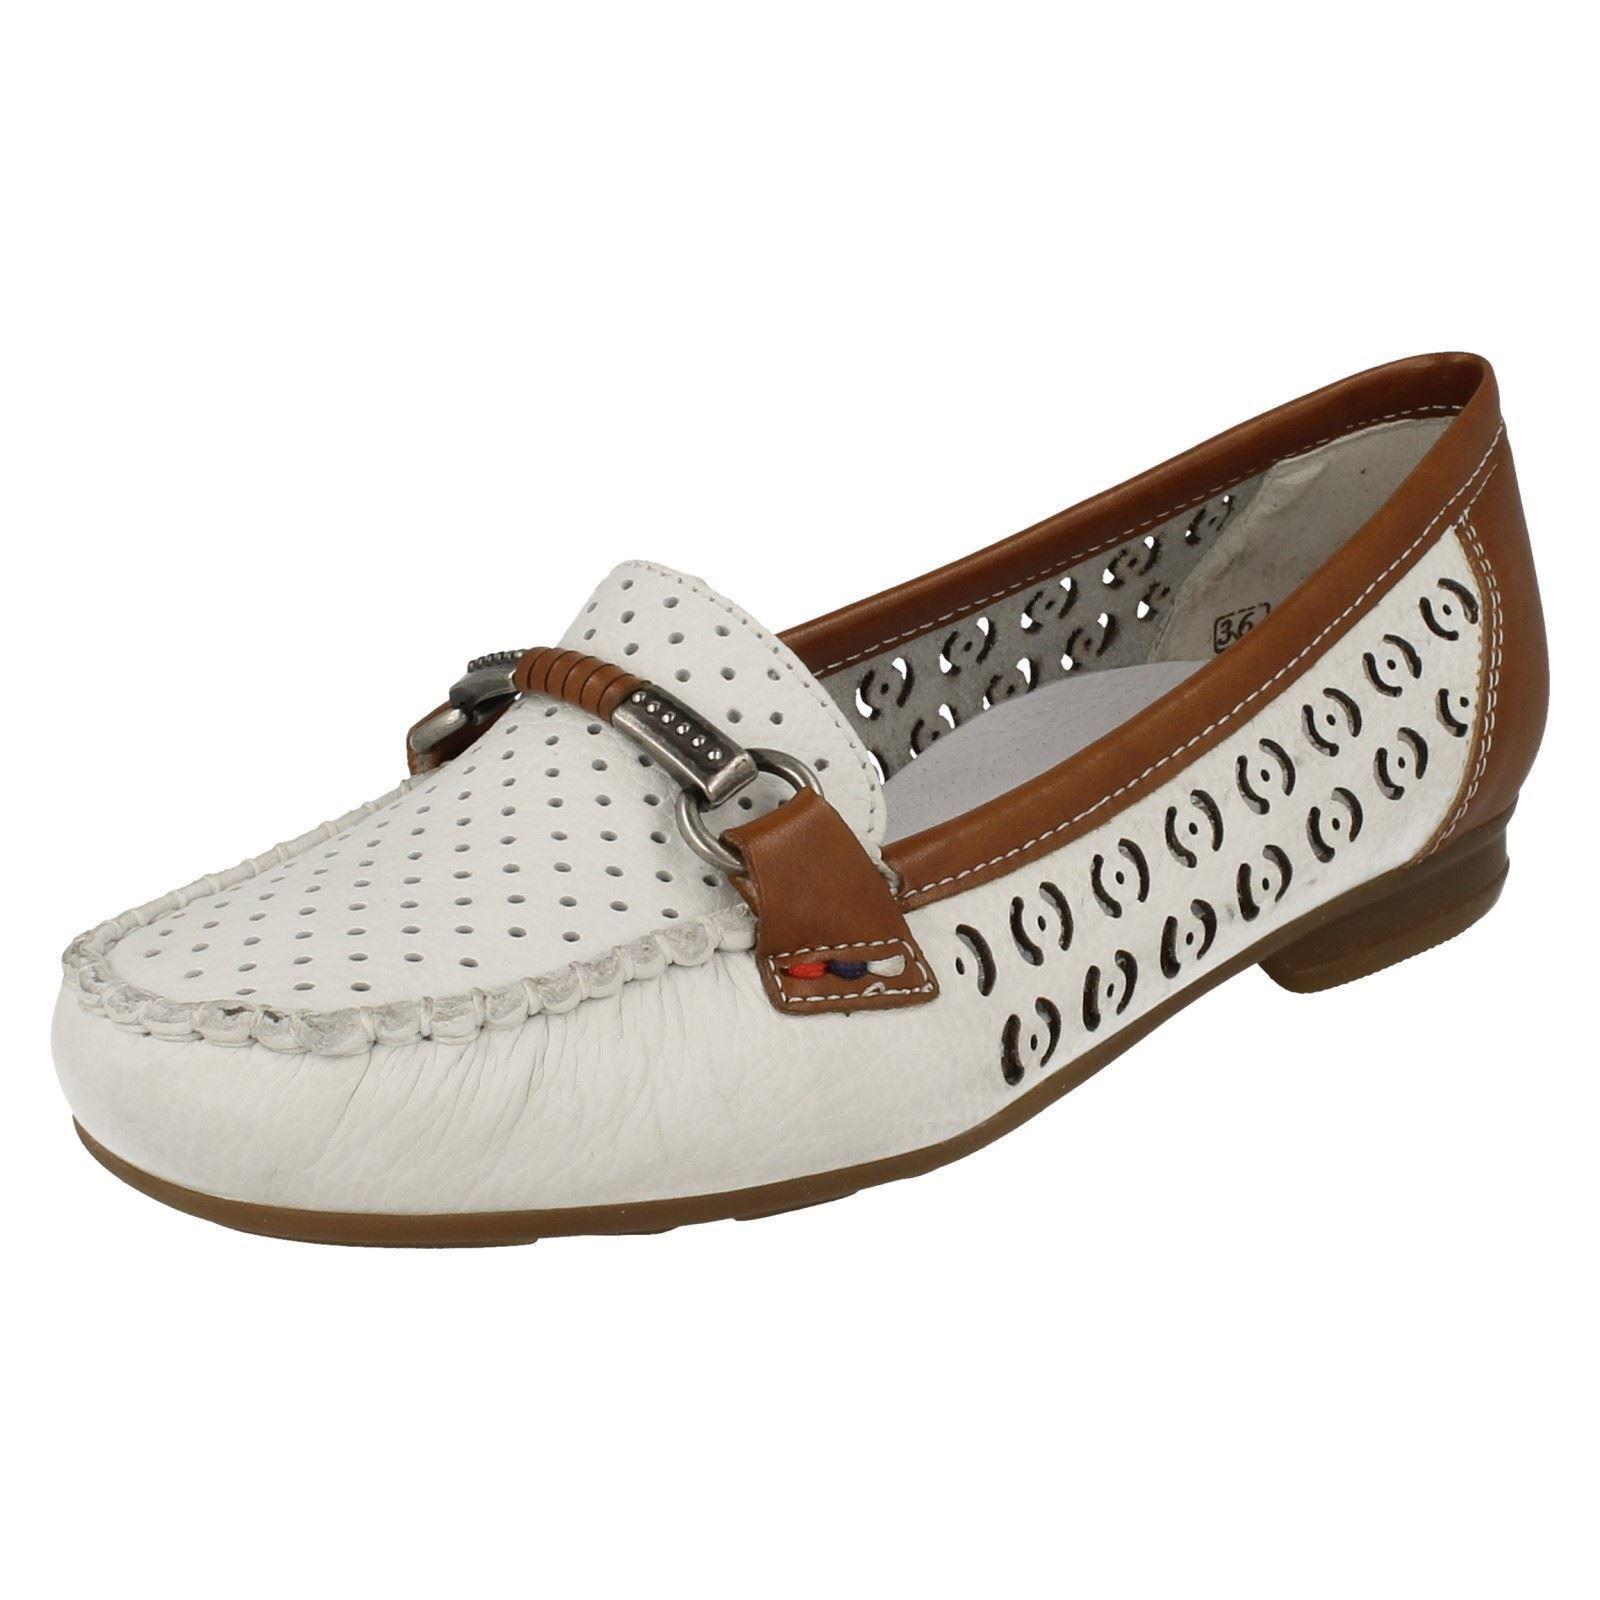 Damen weiß Kombination ohne Bügel Leder-Slipper Reiker Schuhe 40085